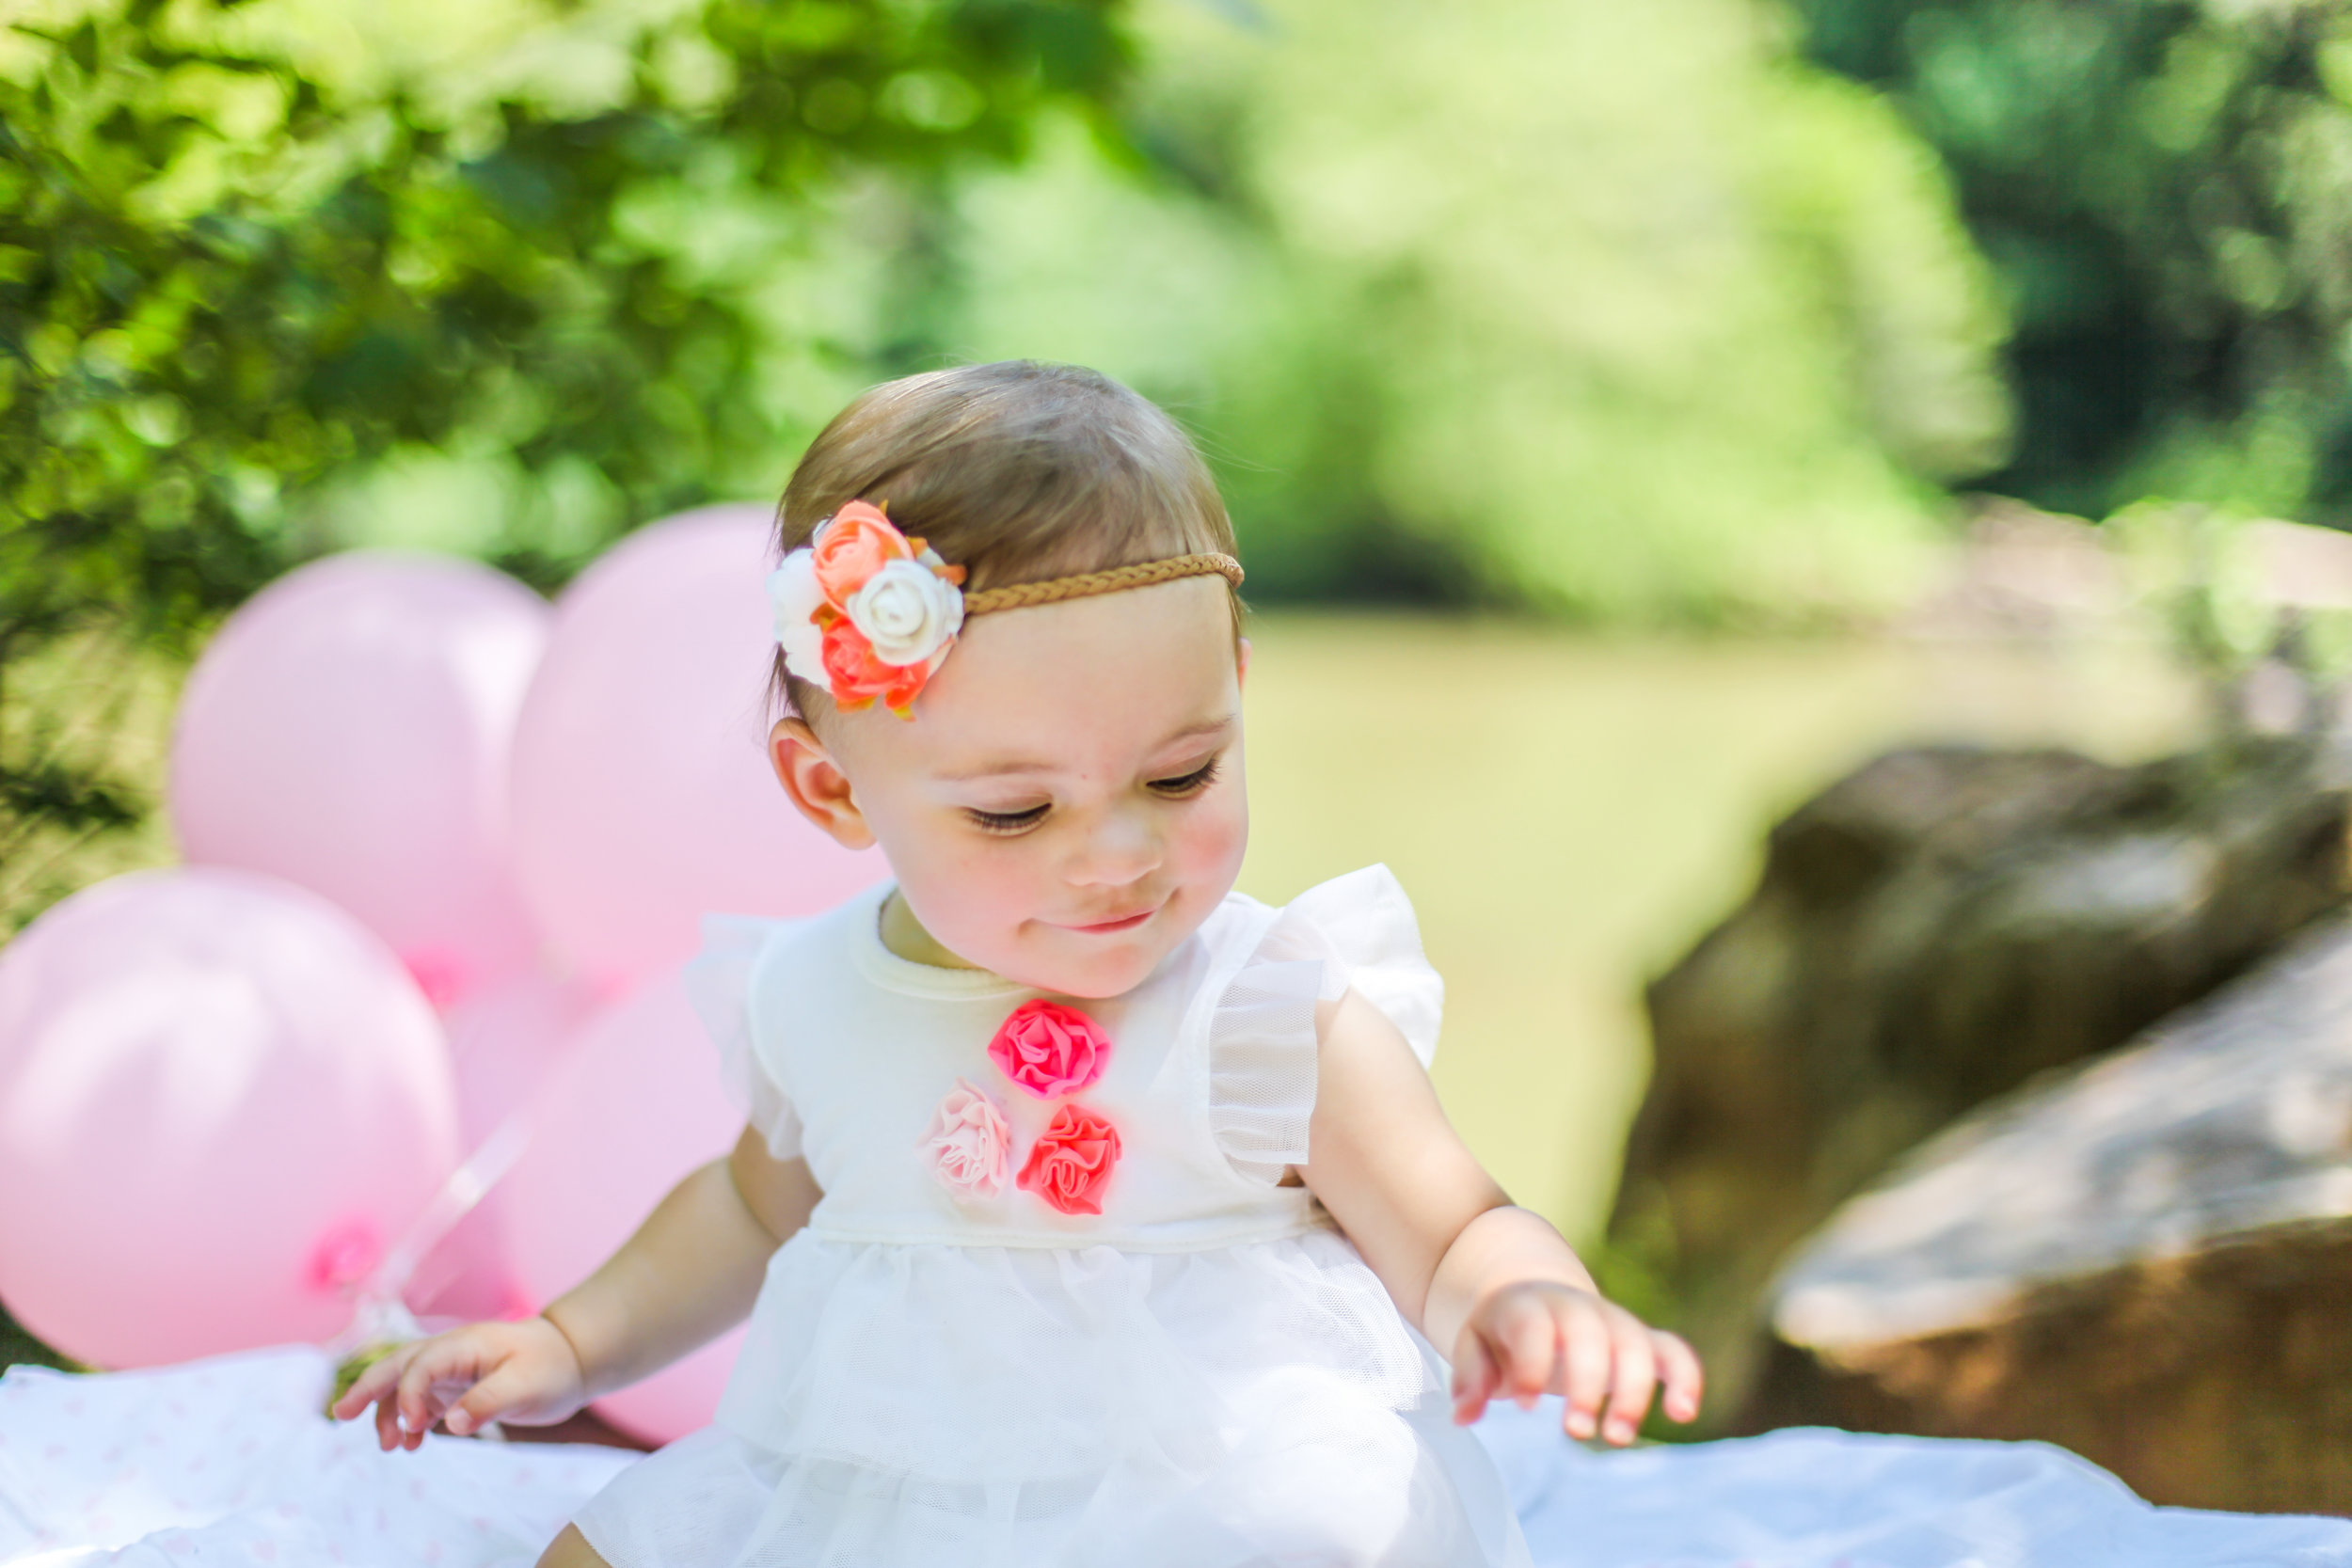 woodstock baby photography angela elliott-71.jpg